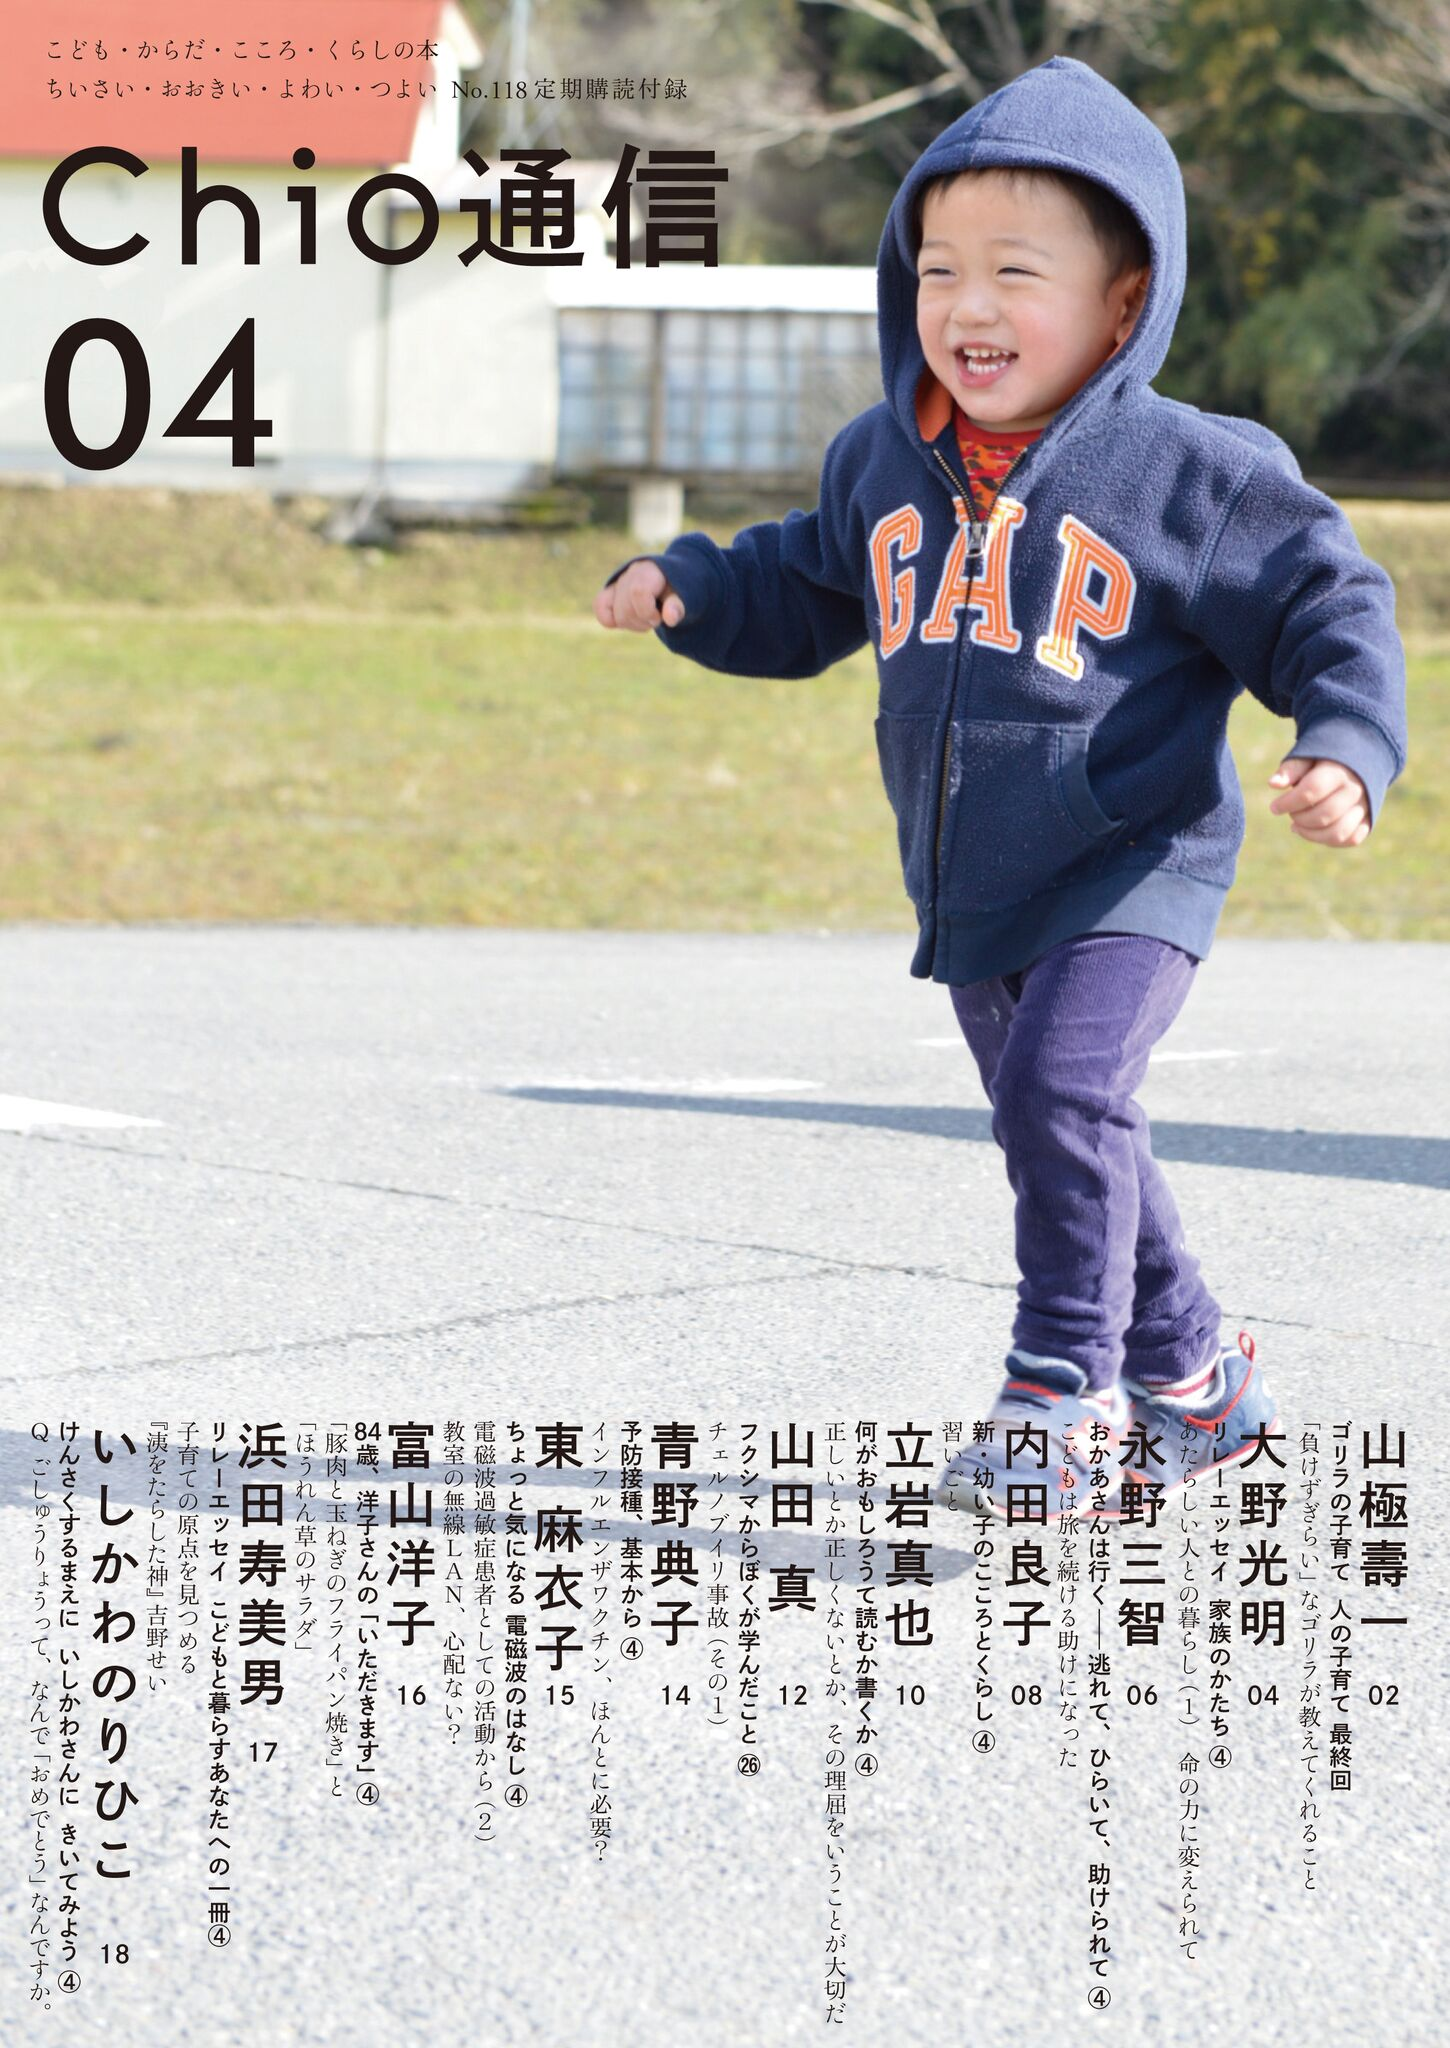 Chio通信 04